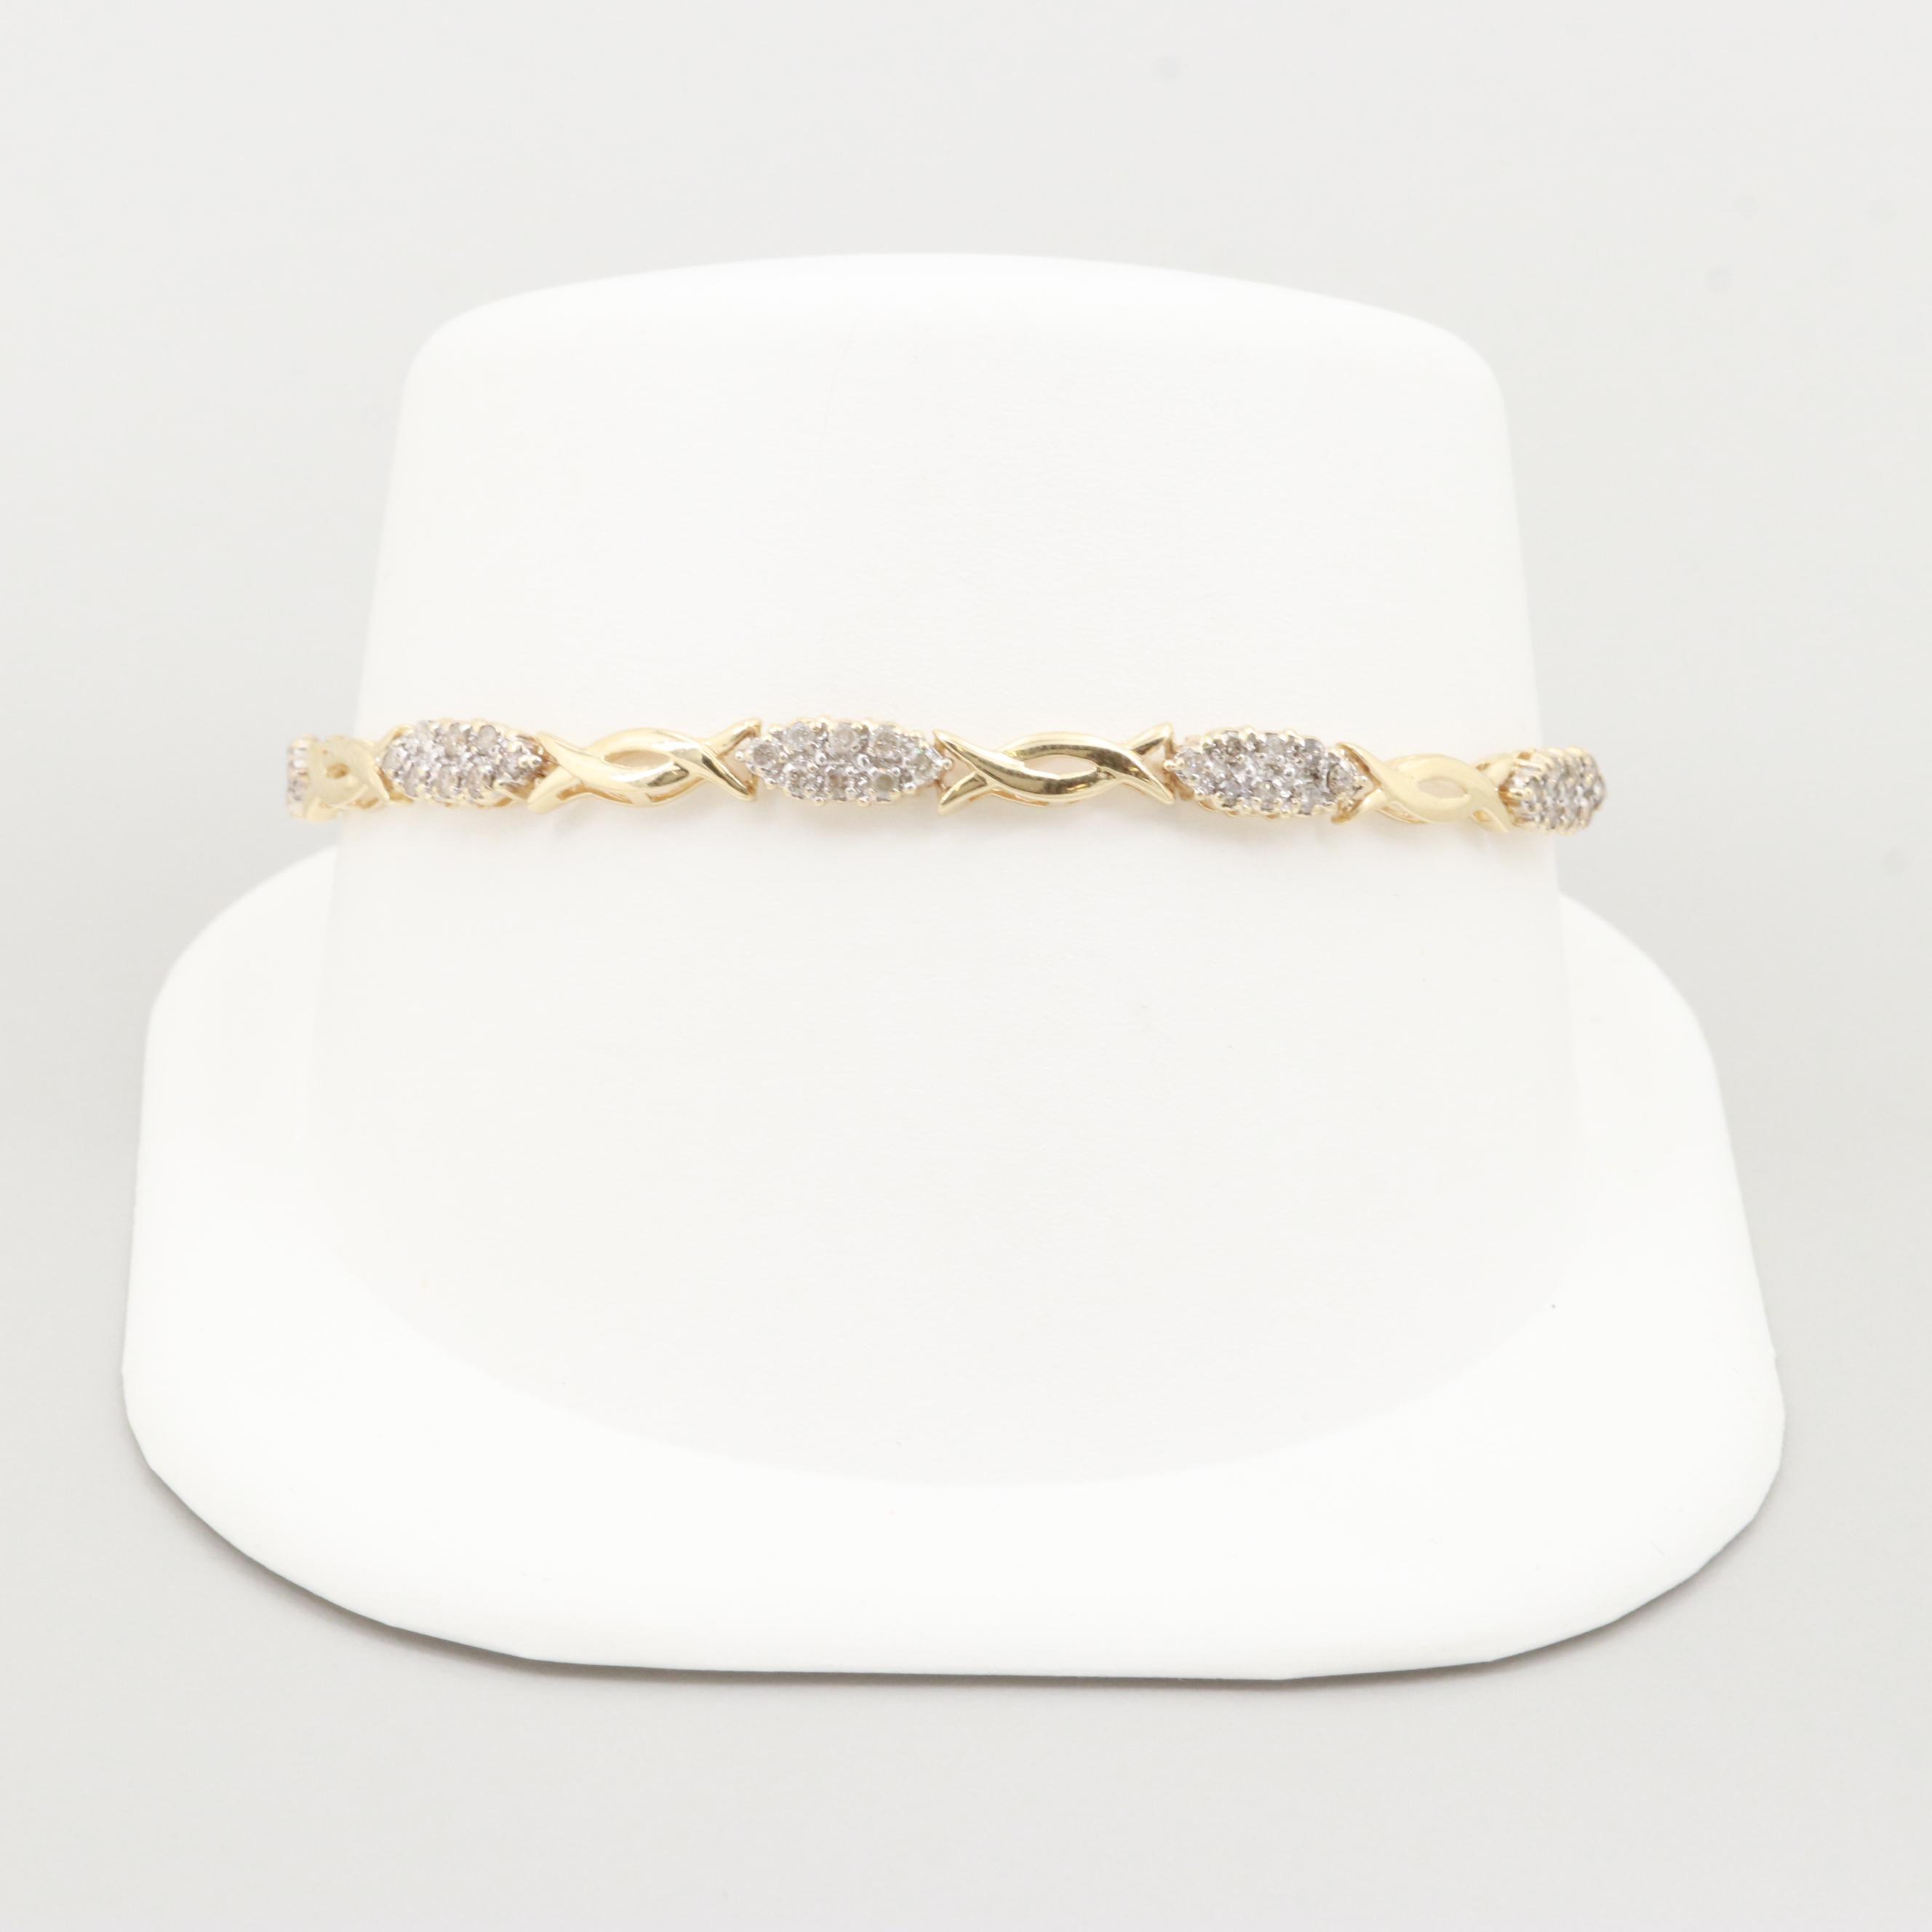 10K Yellow Gold 1.01 CTW Diamond Bracelet